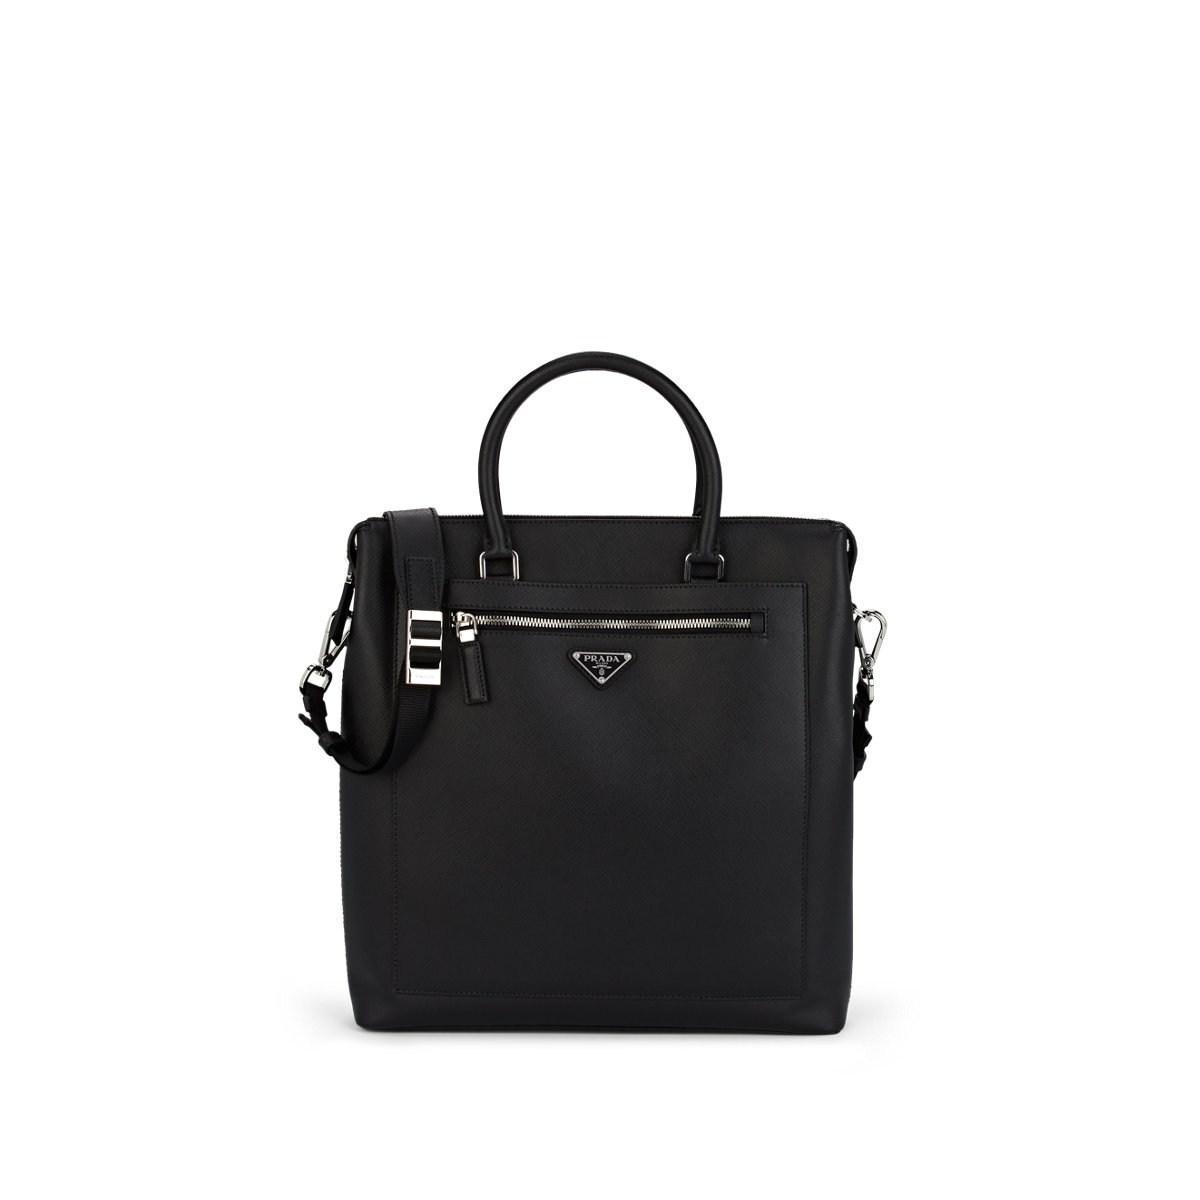 7e37fc0ea1e4 Prada - Black Leather Travel Tote Bag for Men - Lyst. View fullscreen